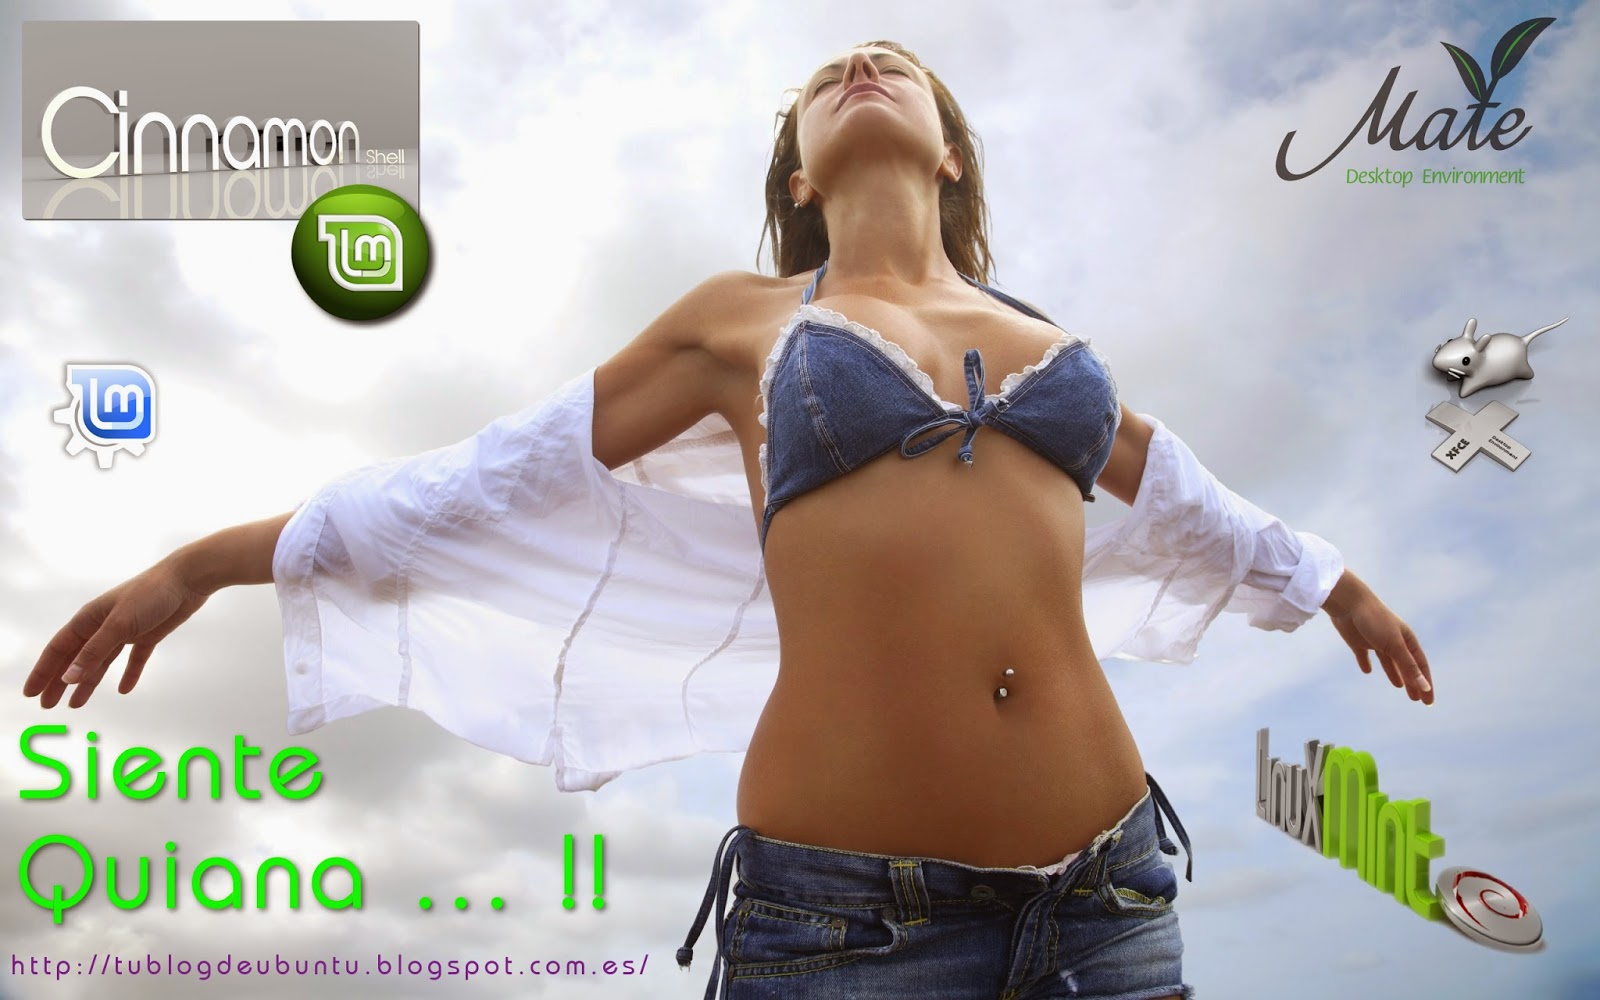 Linux Mint 17 Quiana Cinnamon tu blog de ubuntu